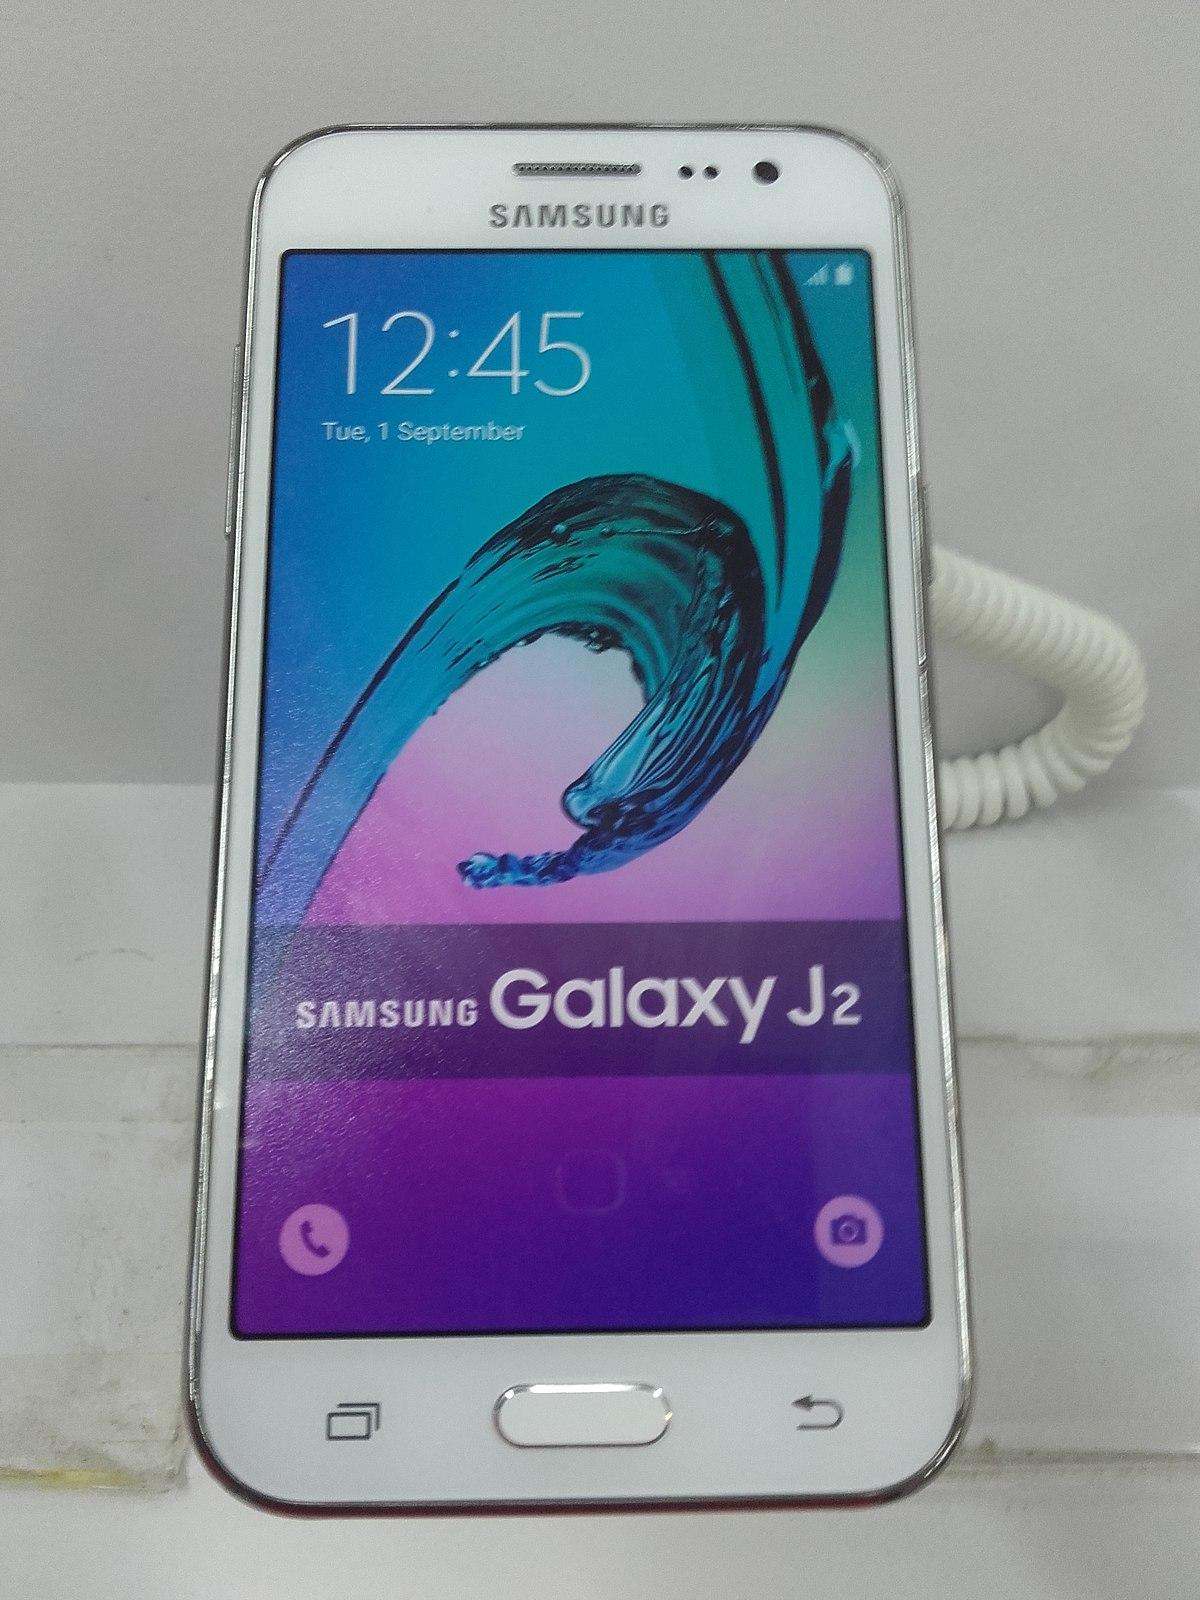 Samsung Galaxy J2 Prime - Wikidata